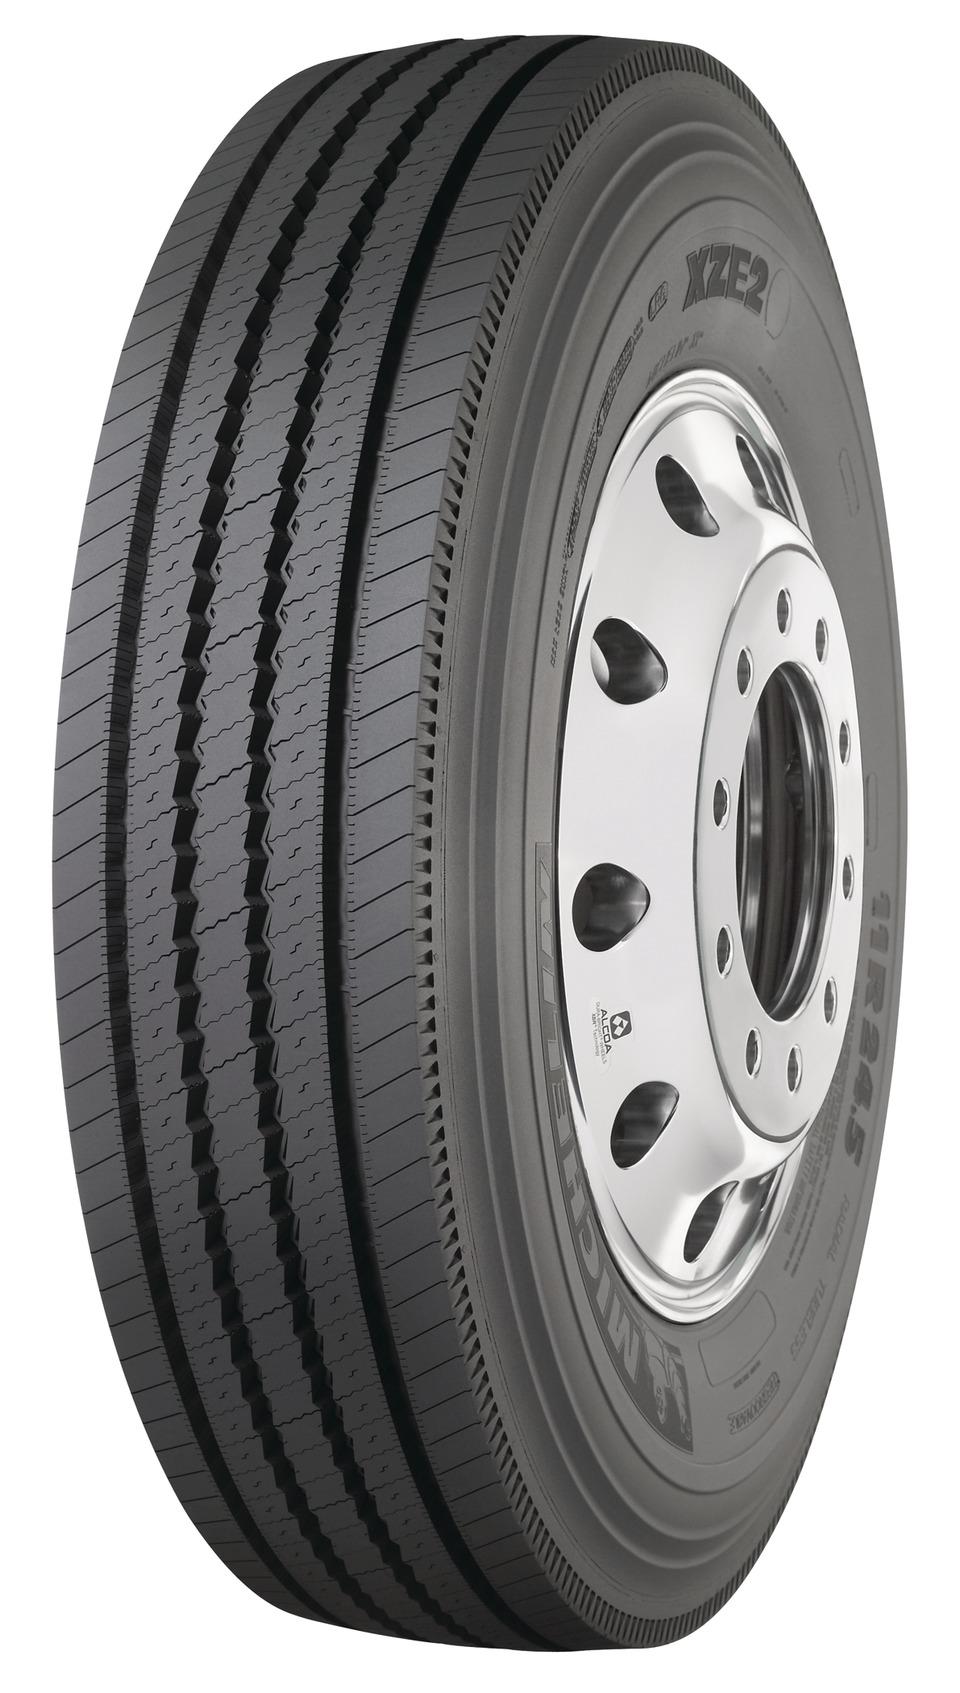 Americas Best Tire >> Michelin North America Xze2 Tire In Home